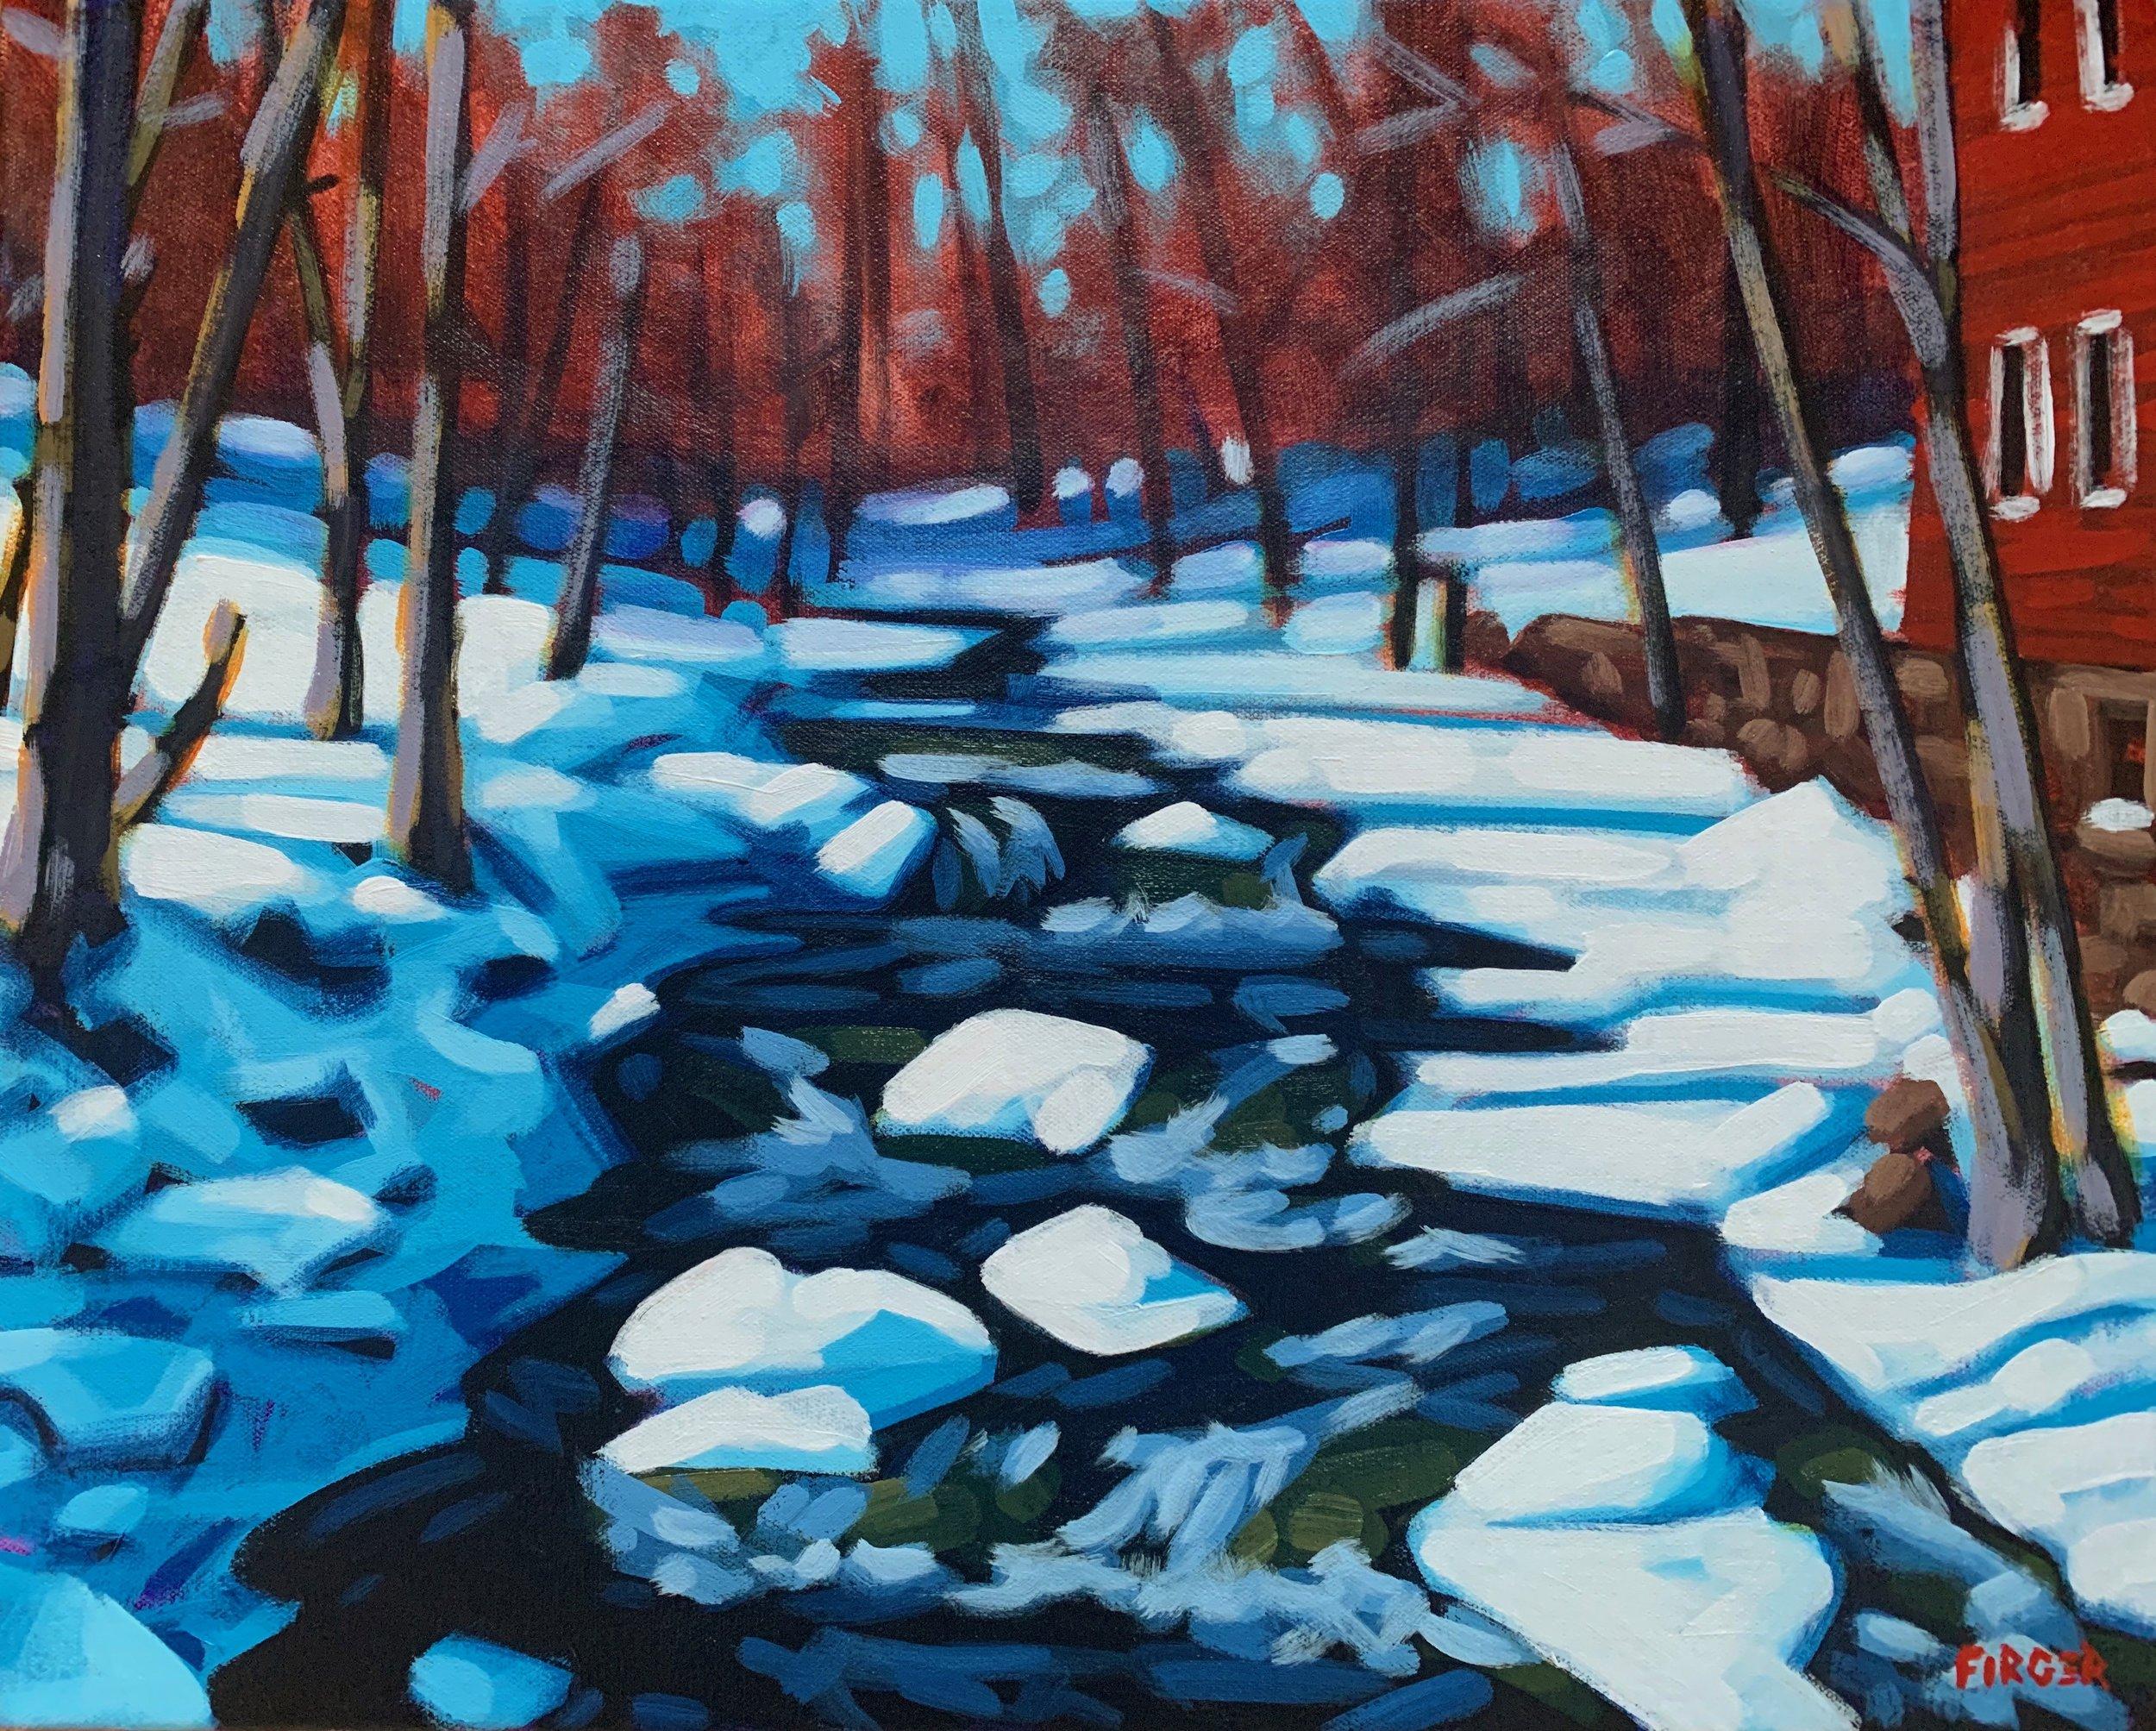 Sunlit Stream - 16 x 20, Acrylic on Canvas